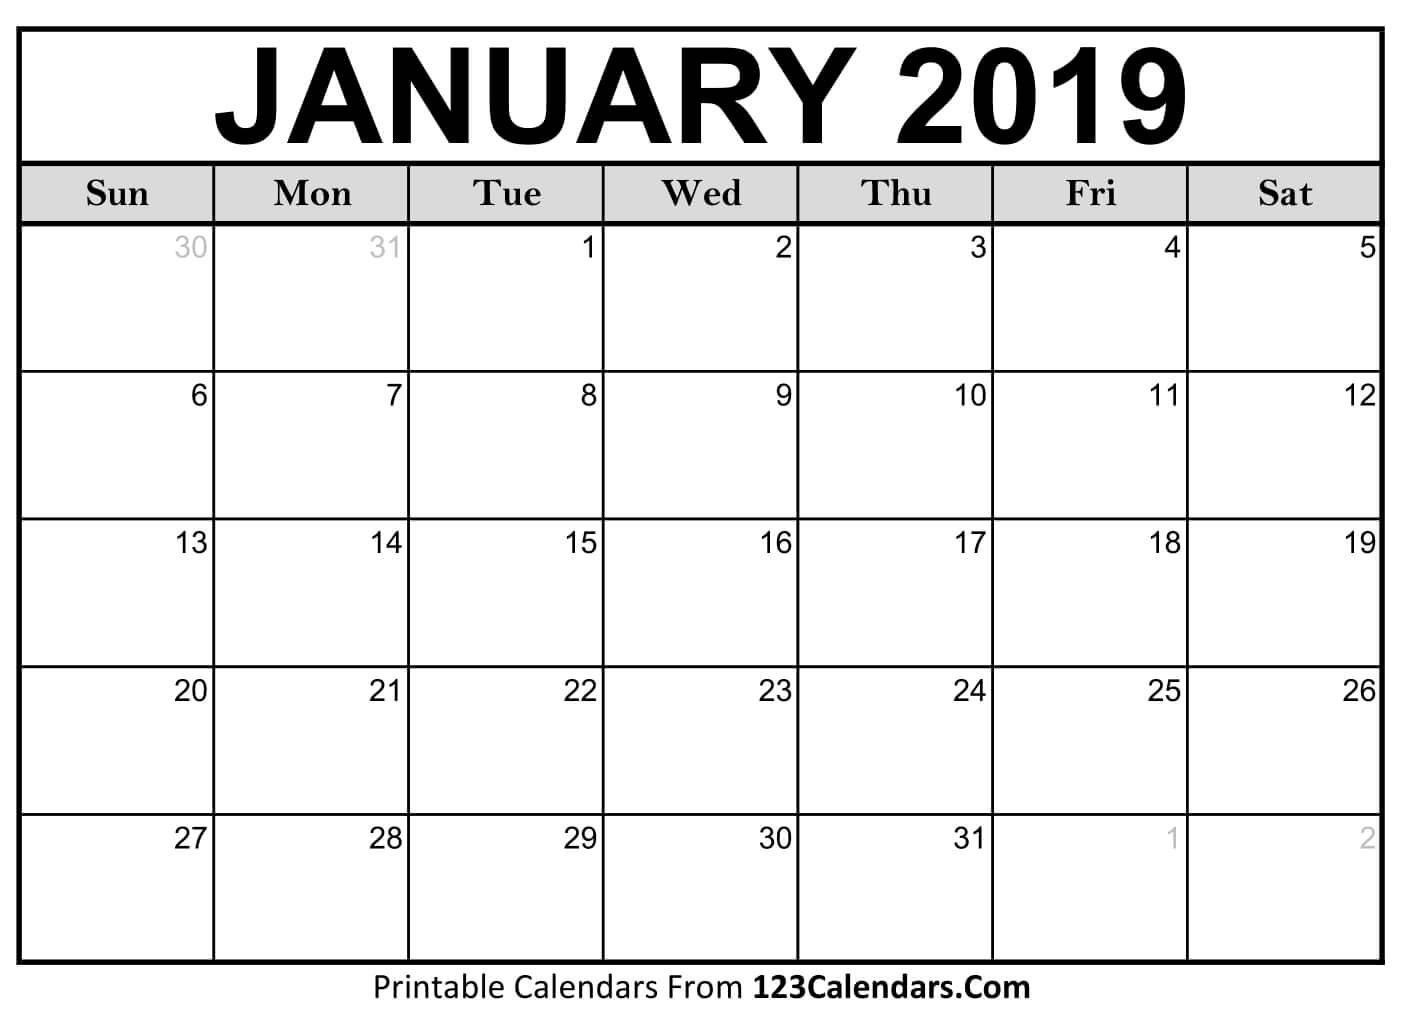 2019 January Calendar Printable – Printable Calendar 2019| Blank Calendar Of 2019 January